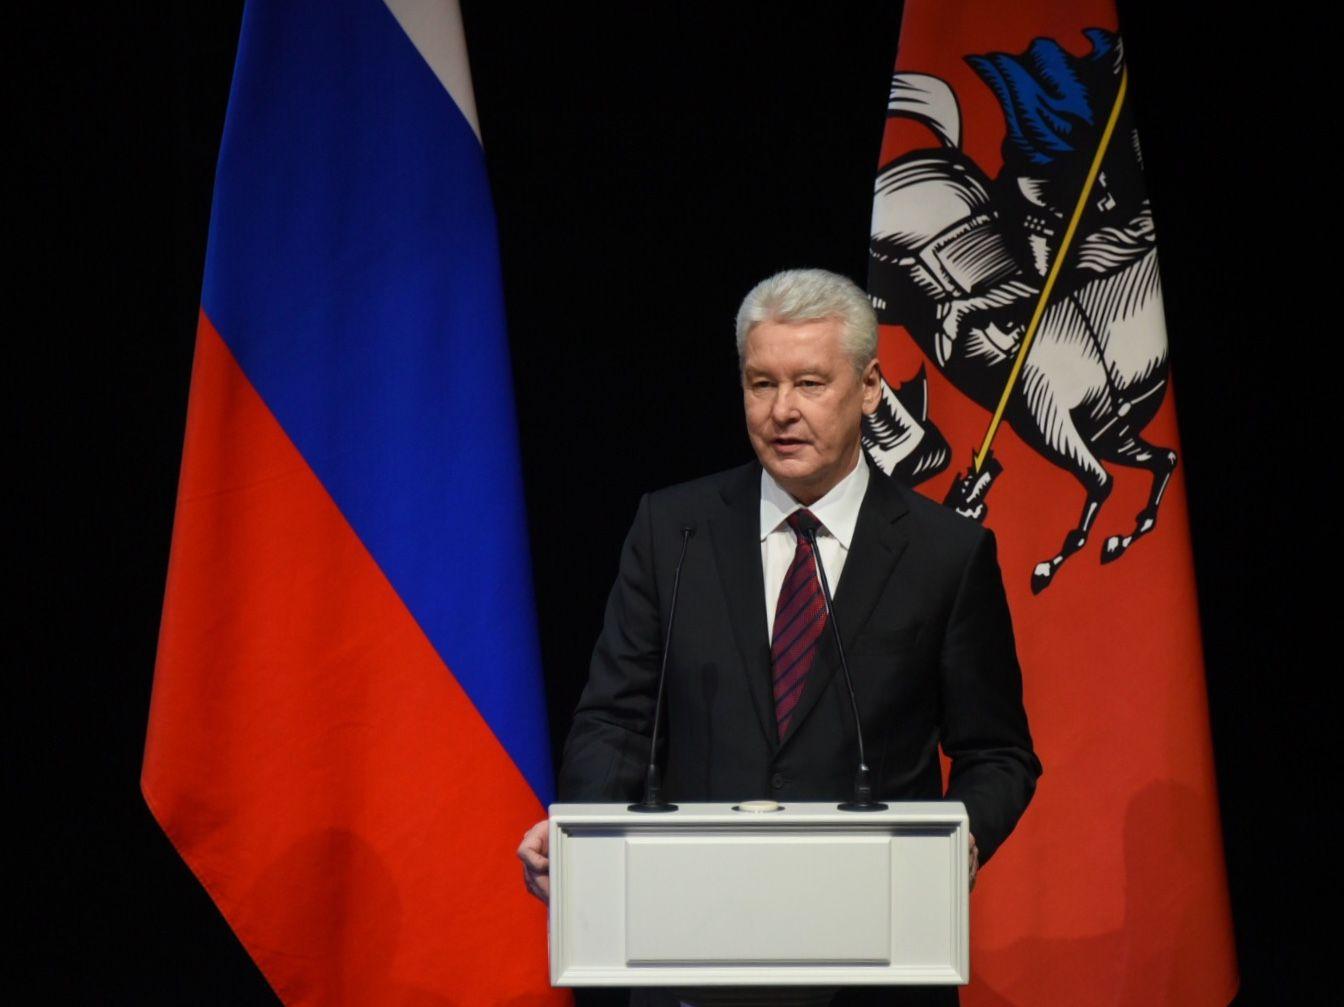 Символ славы: Сергей Собянин поздравил москвичей с Днем флага